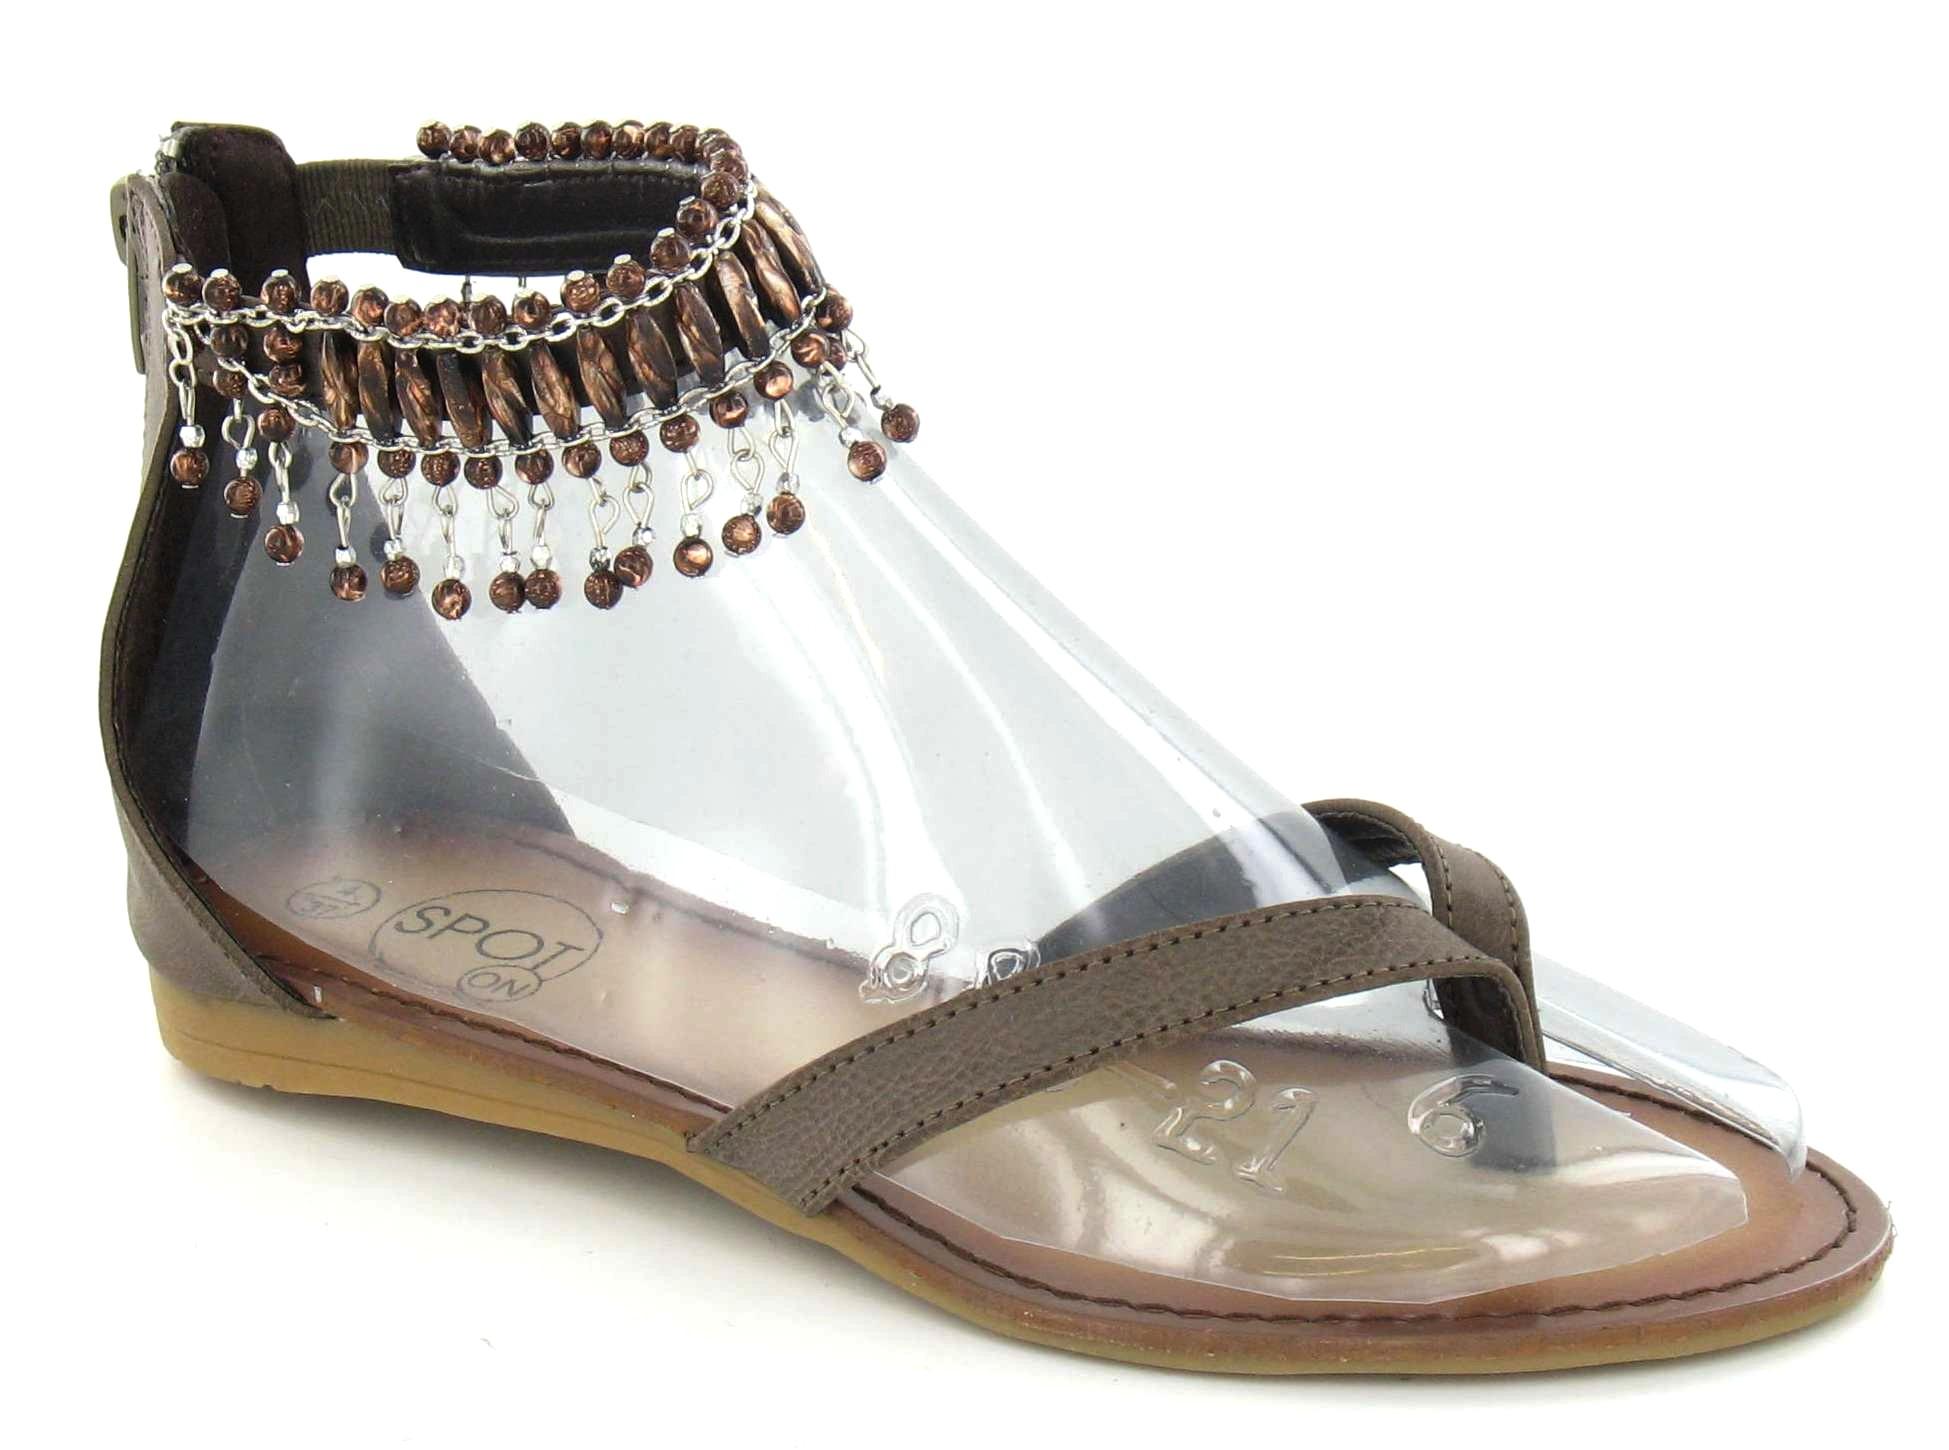 spot on flache zehenschuhe sandalen mit perlen kn chel. Black Bedroom Furniture Sets. Home Design Ideas